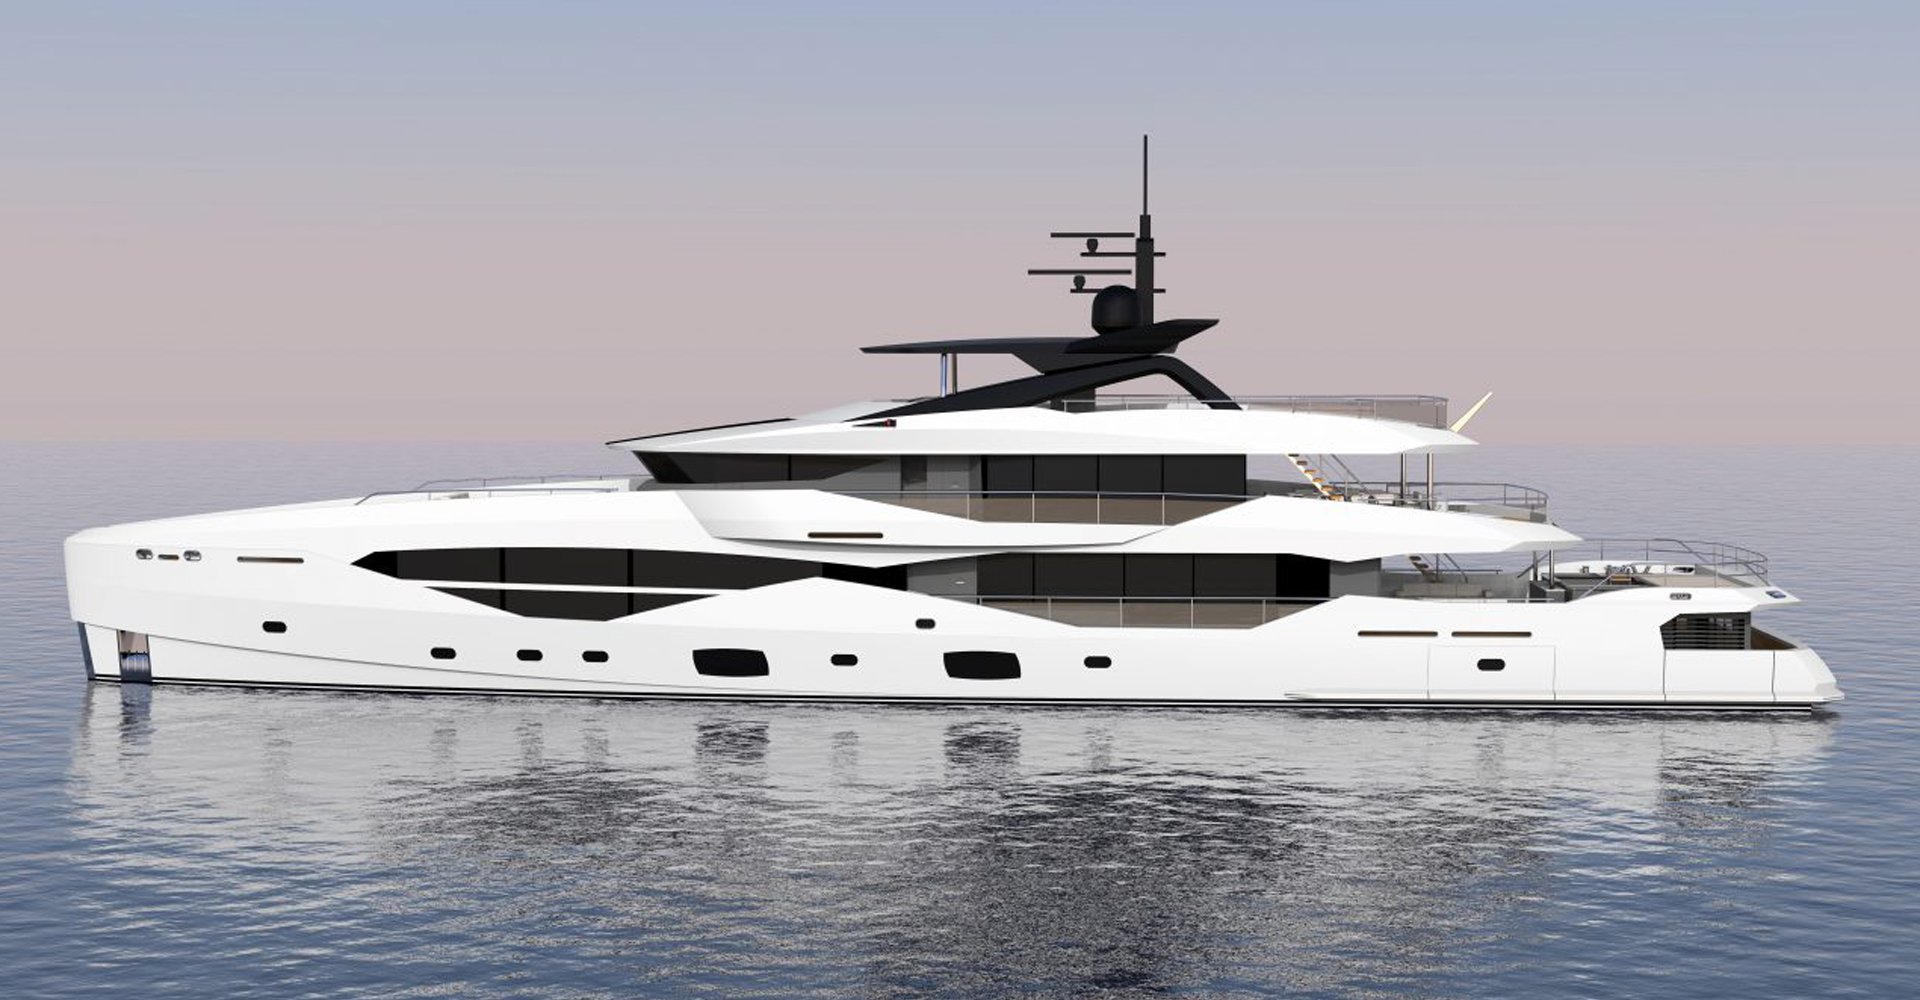 Exterior rendering of a Sunseeker superyacht